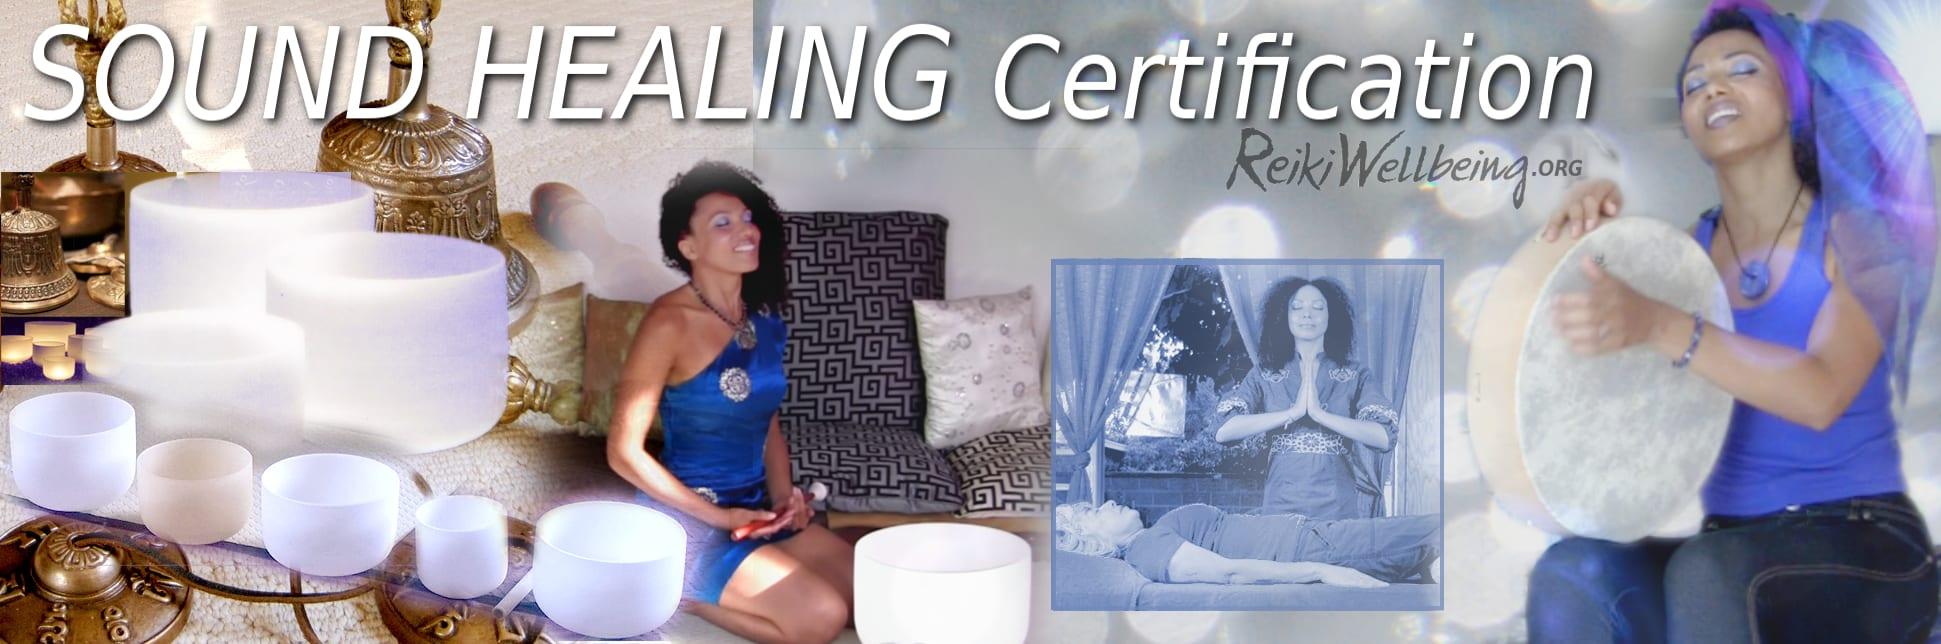 Sound Healing Certification